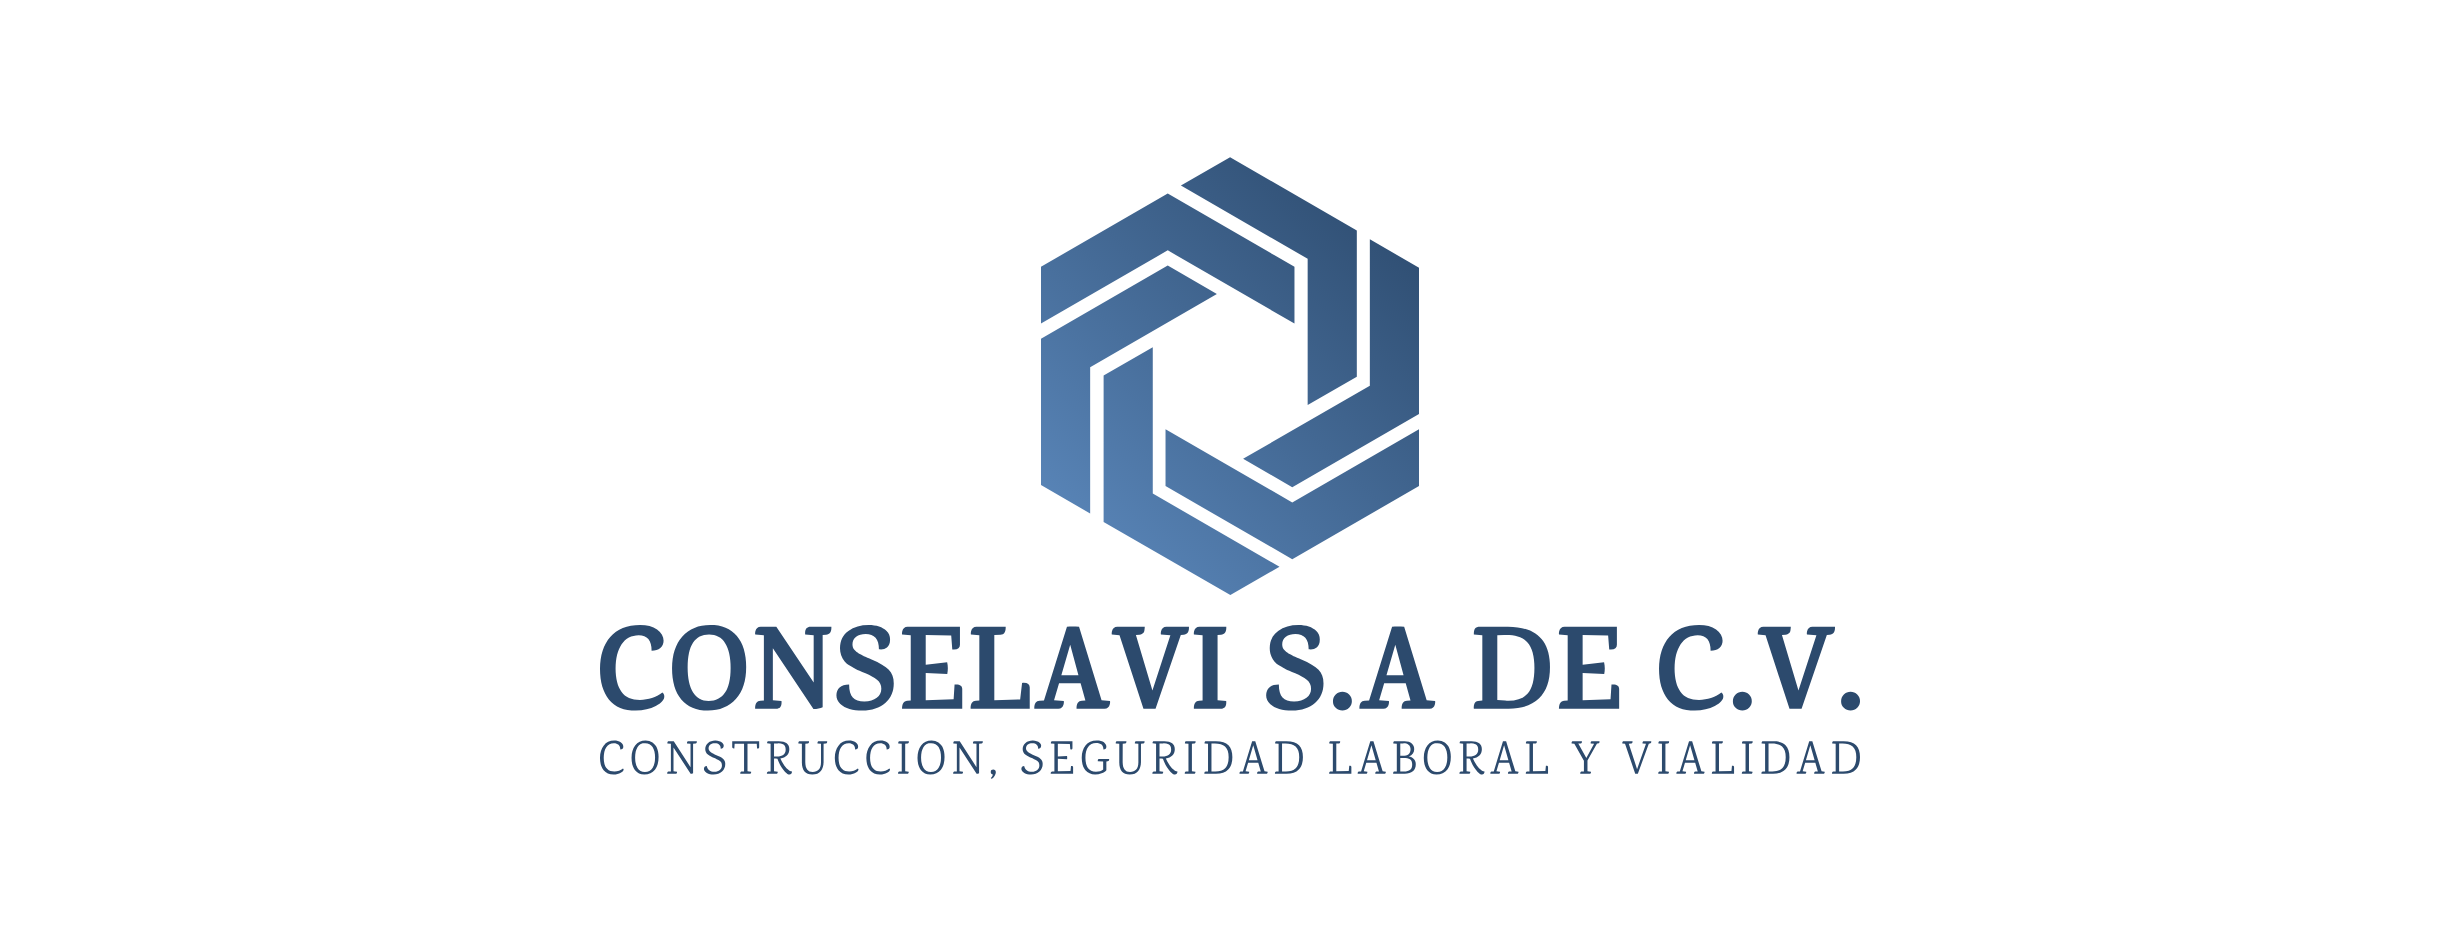 Conselavi S.A. de C.V.